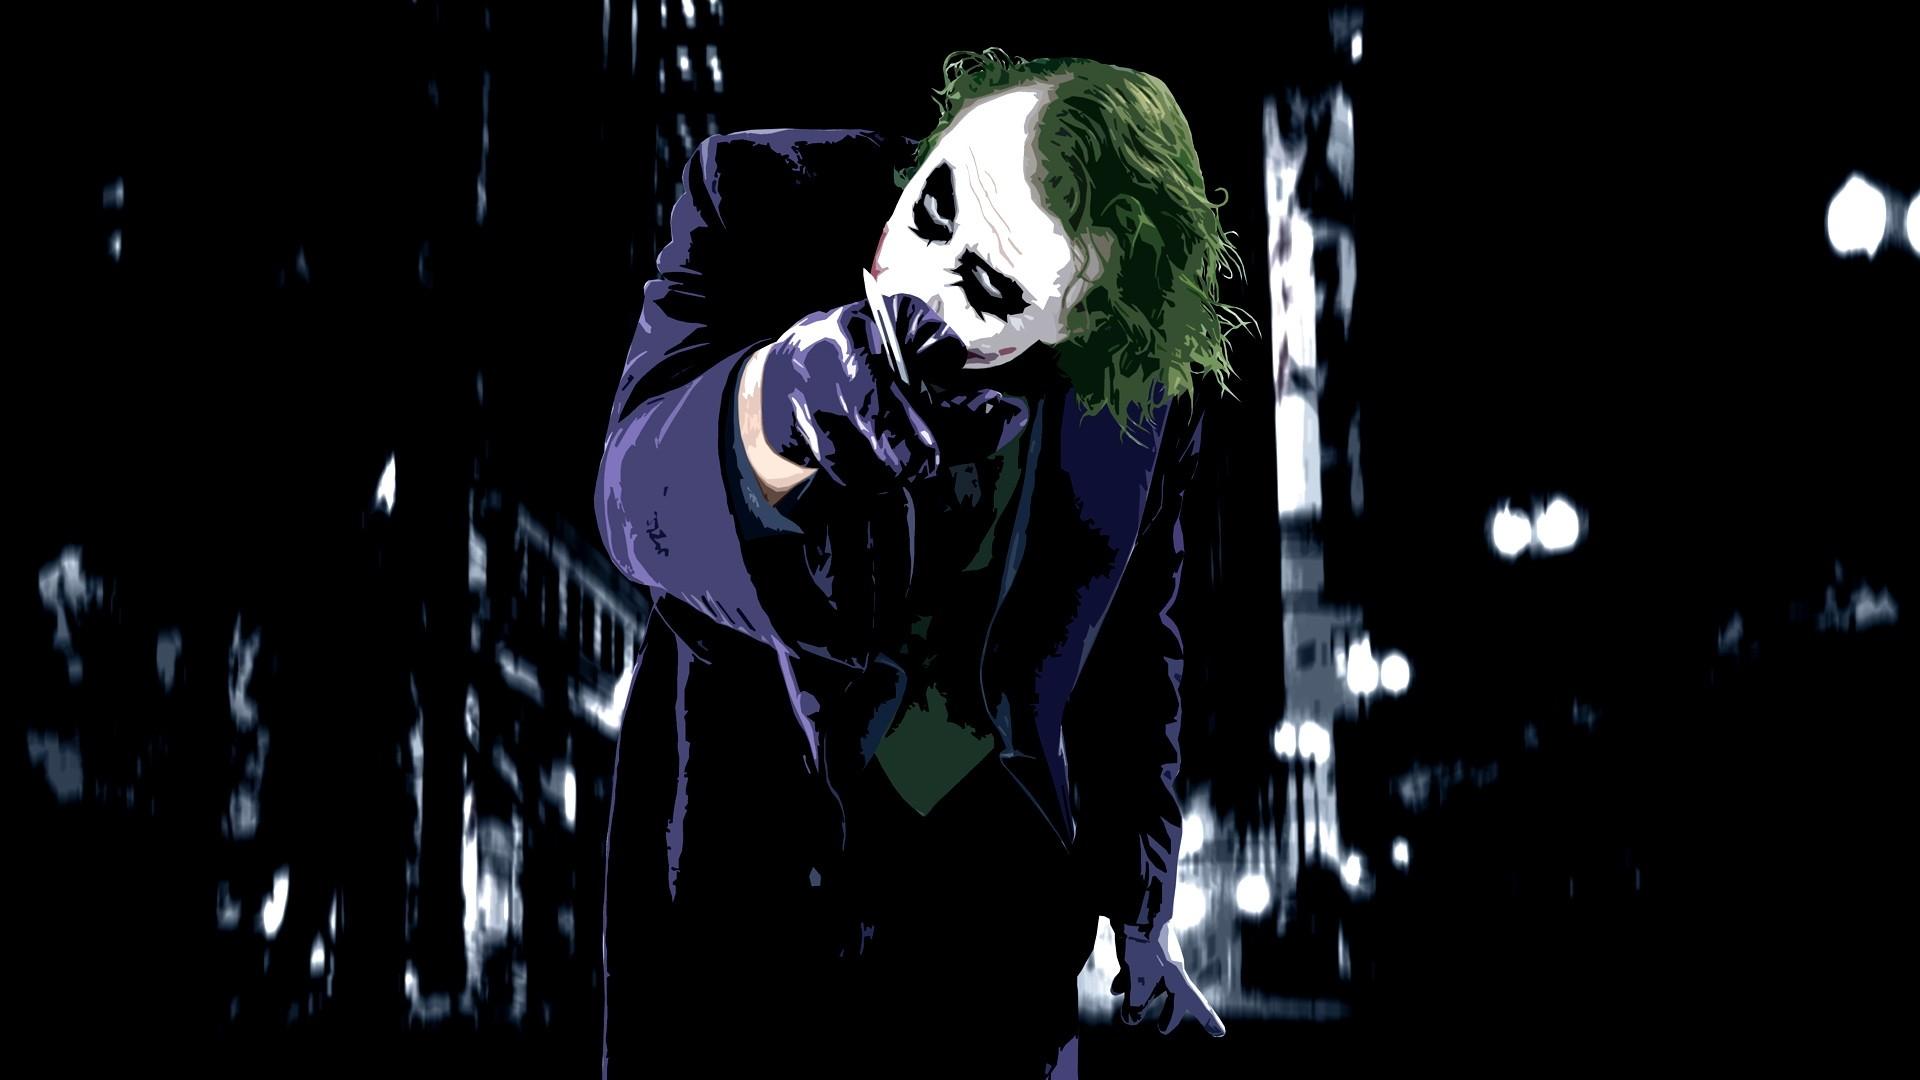 Joker HD Wallpapers Wallpaper